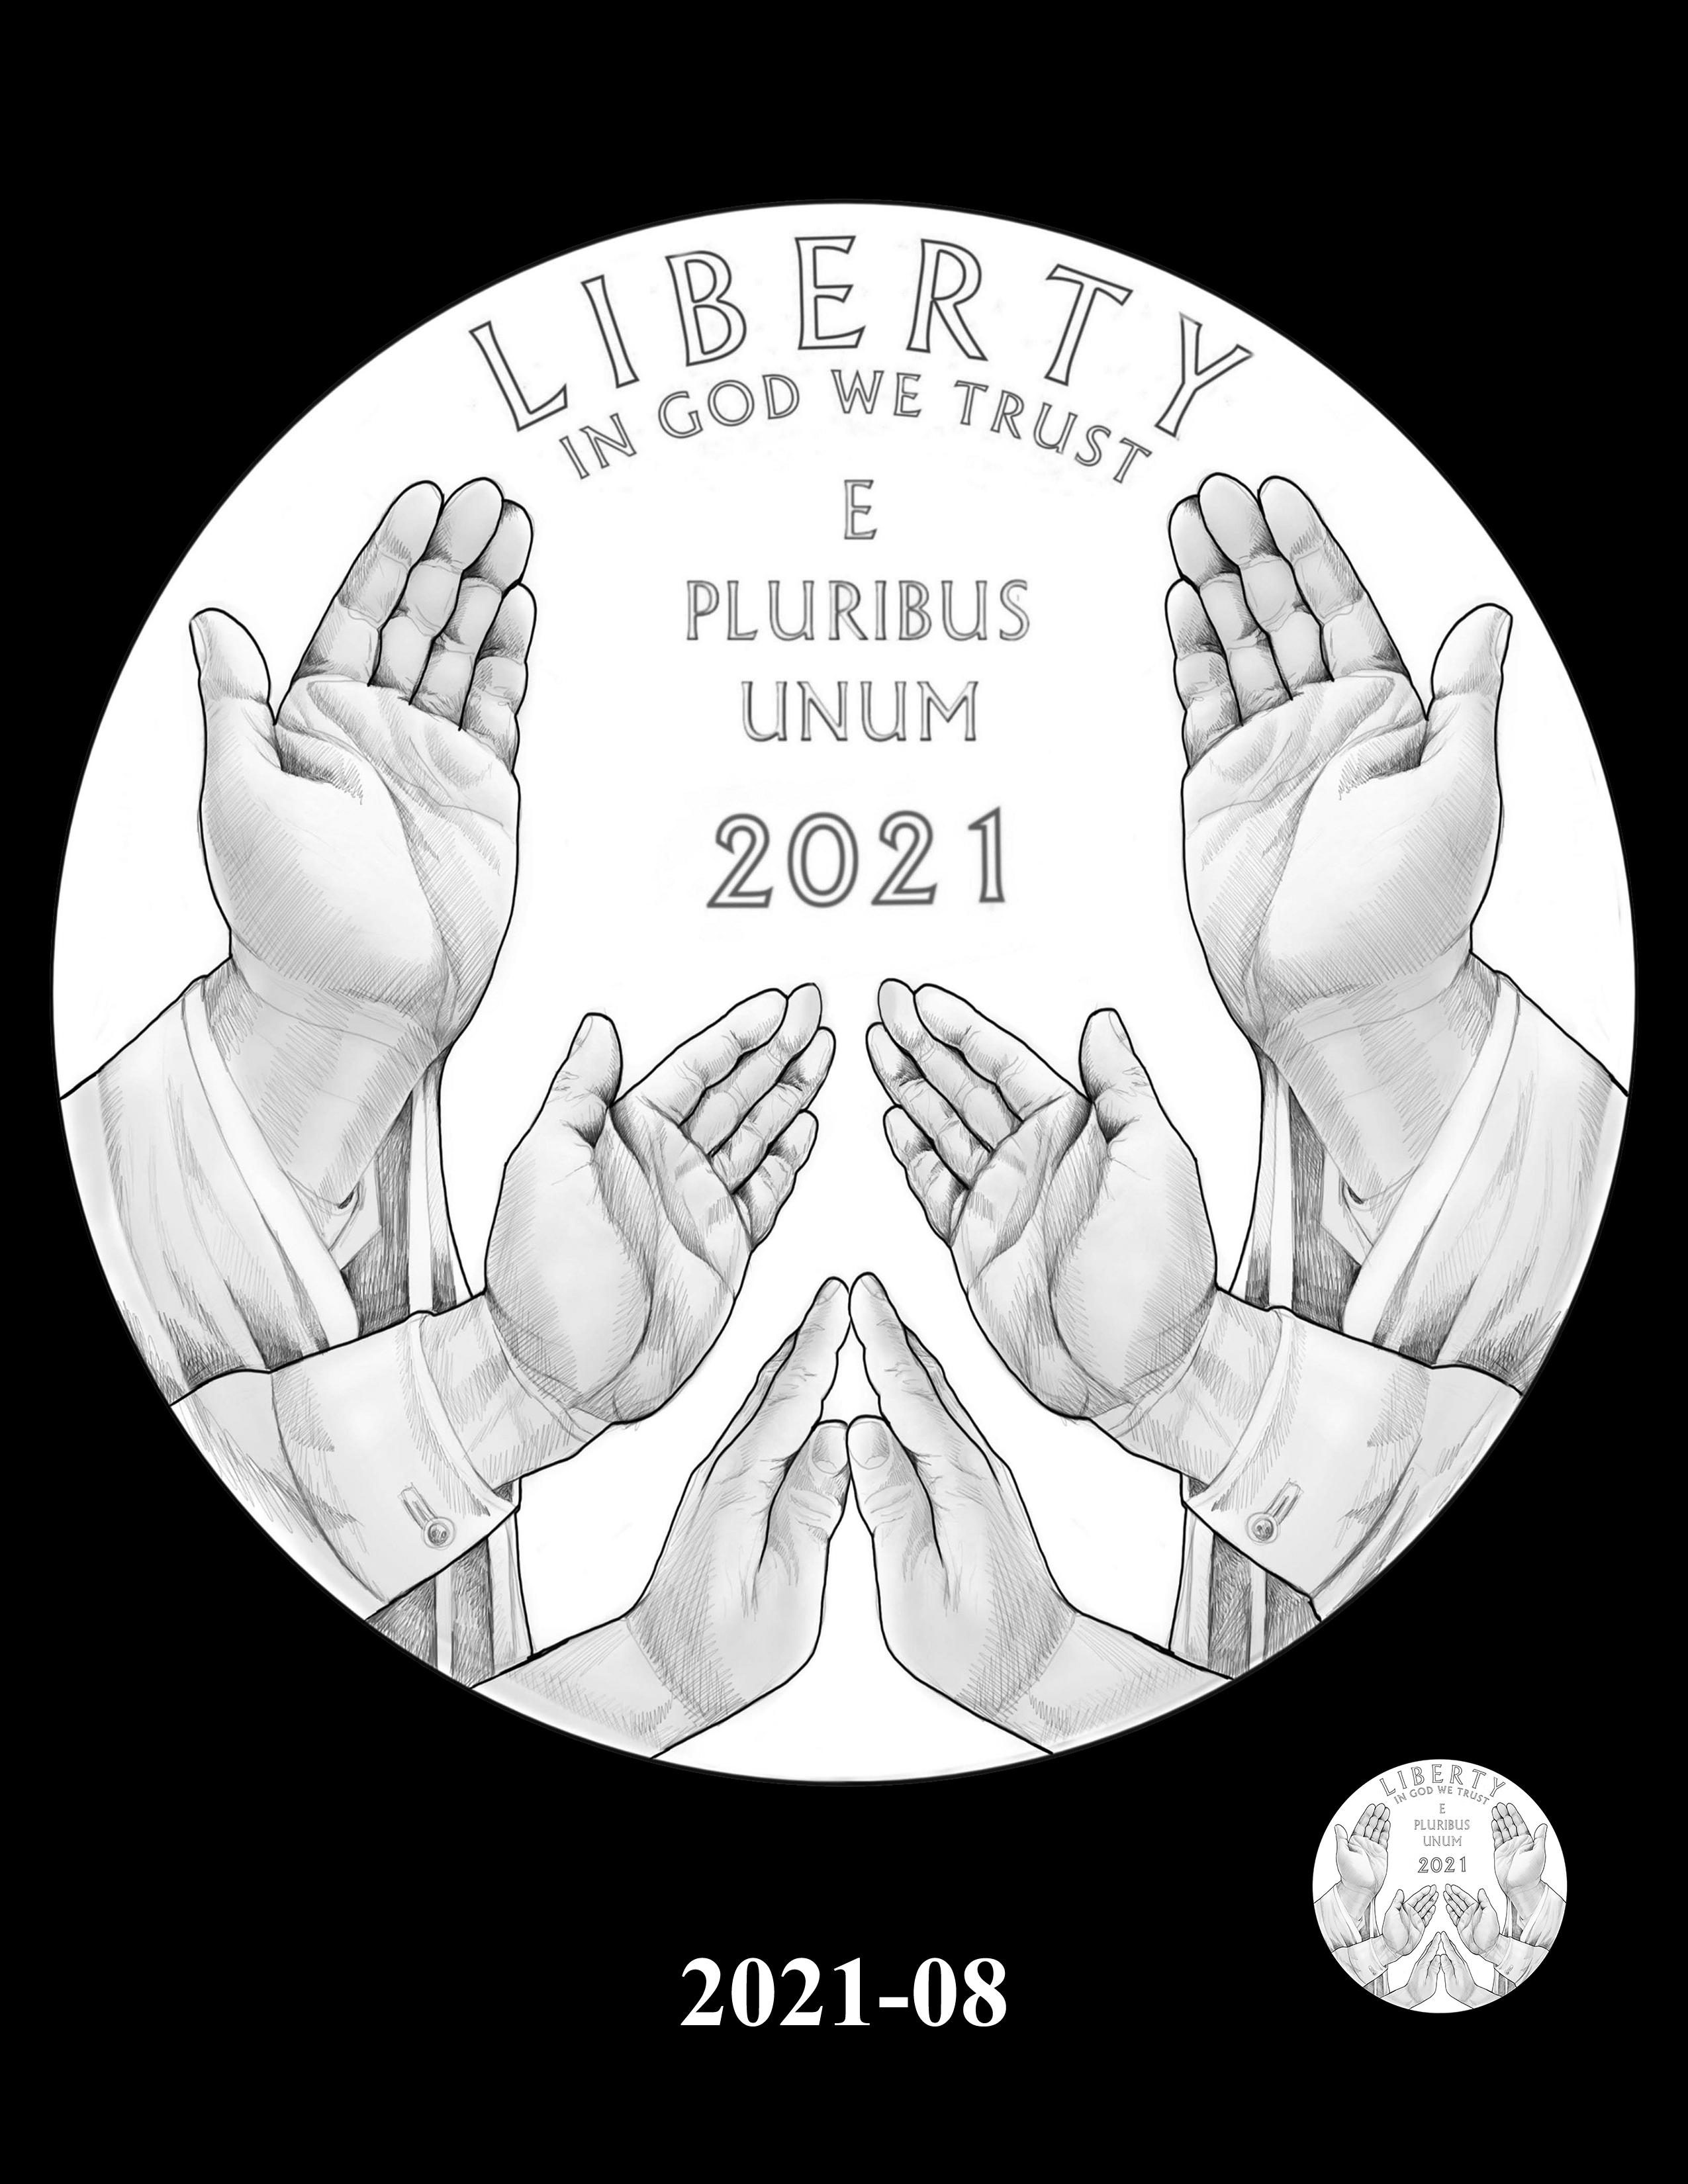 08-2021 -- 2021 - 2025 American Eagle Platinum Proof Program